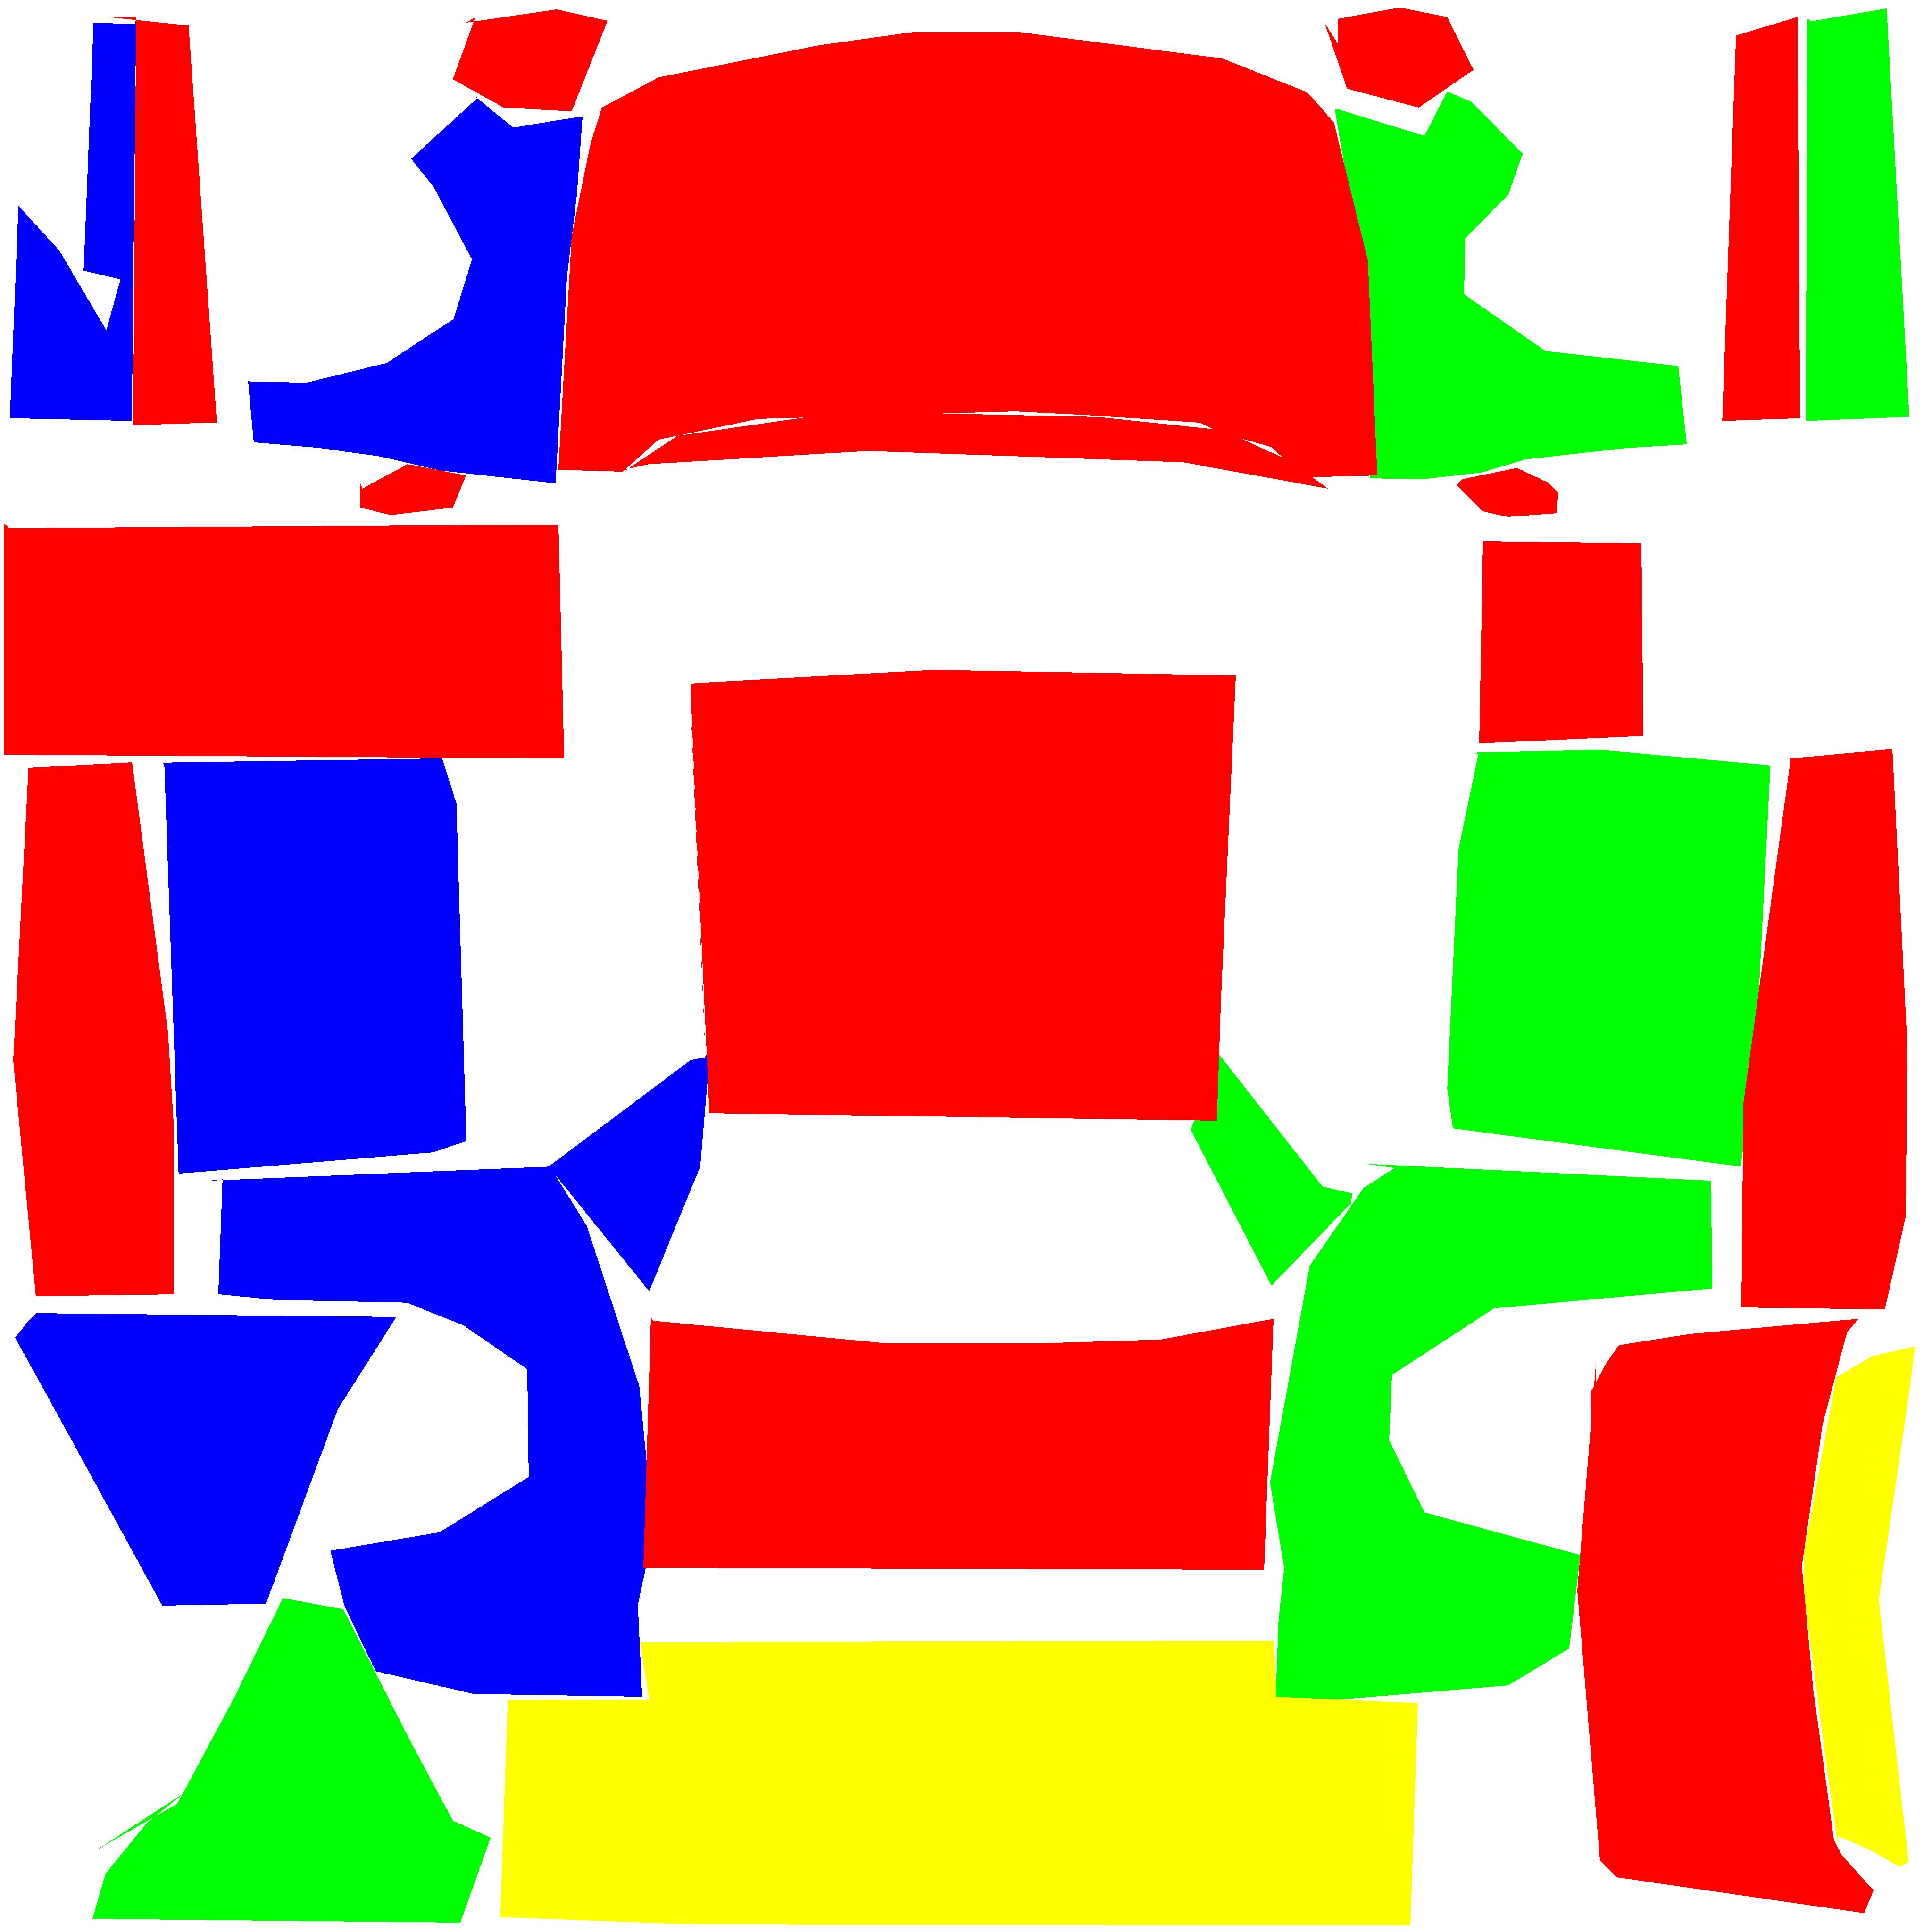 veh_ripple_map.png